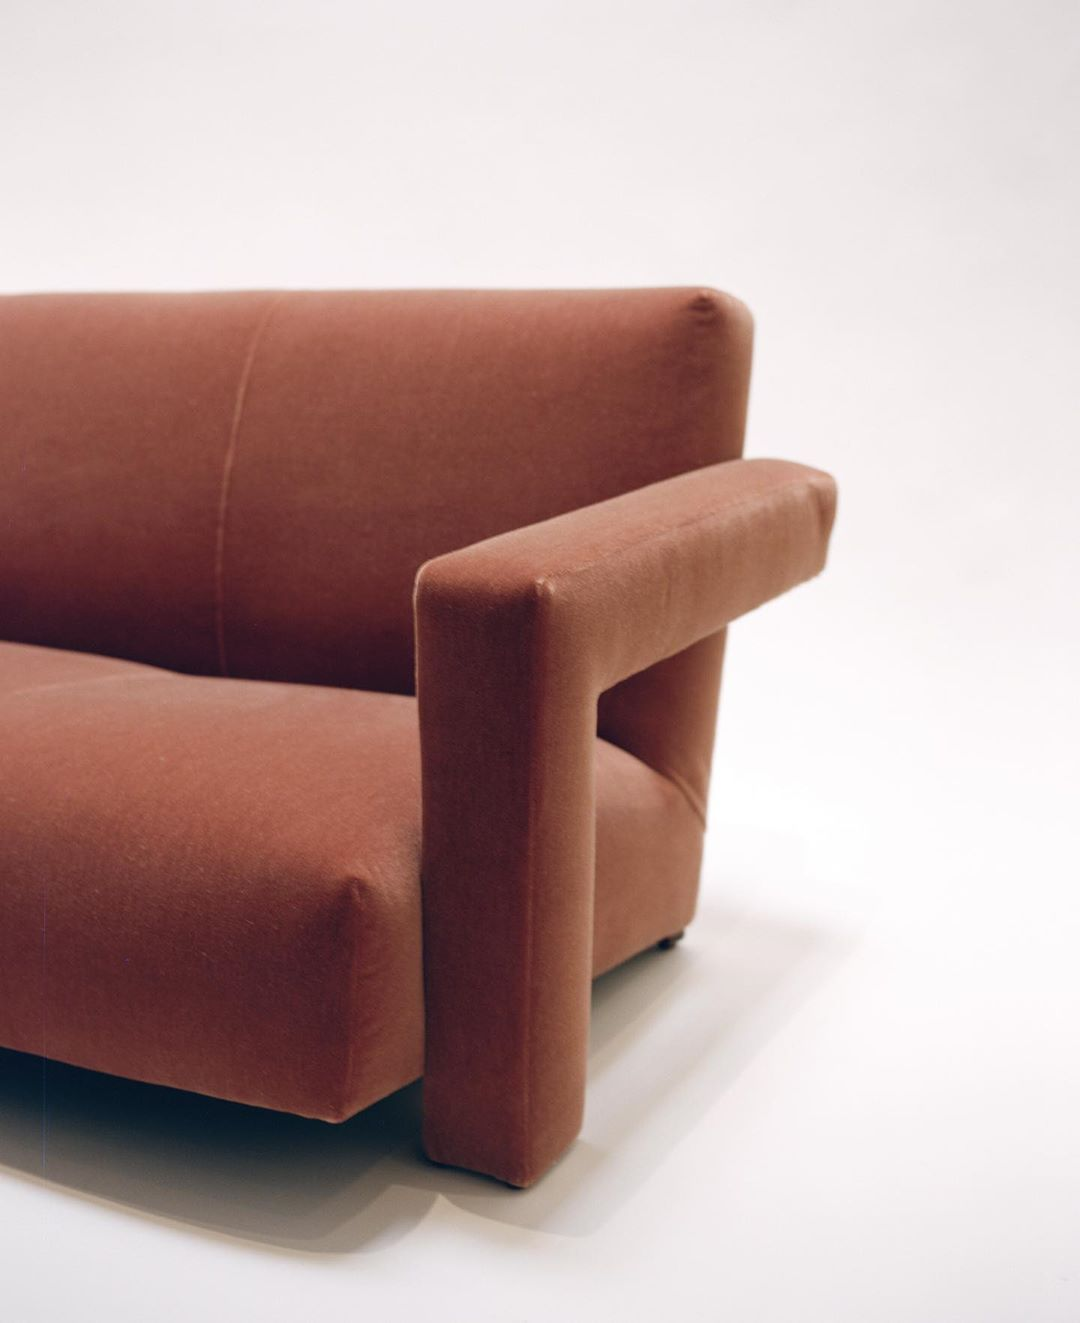 Formative Modern On Instagram Gerrit Thomas Rietveld Upholstered Three Seater Sofa Later Called The Utrecht Sofa Three Seater Sofa Three Seater Upholster